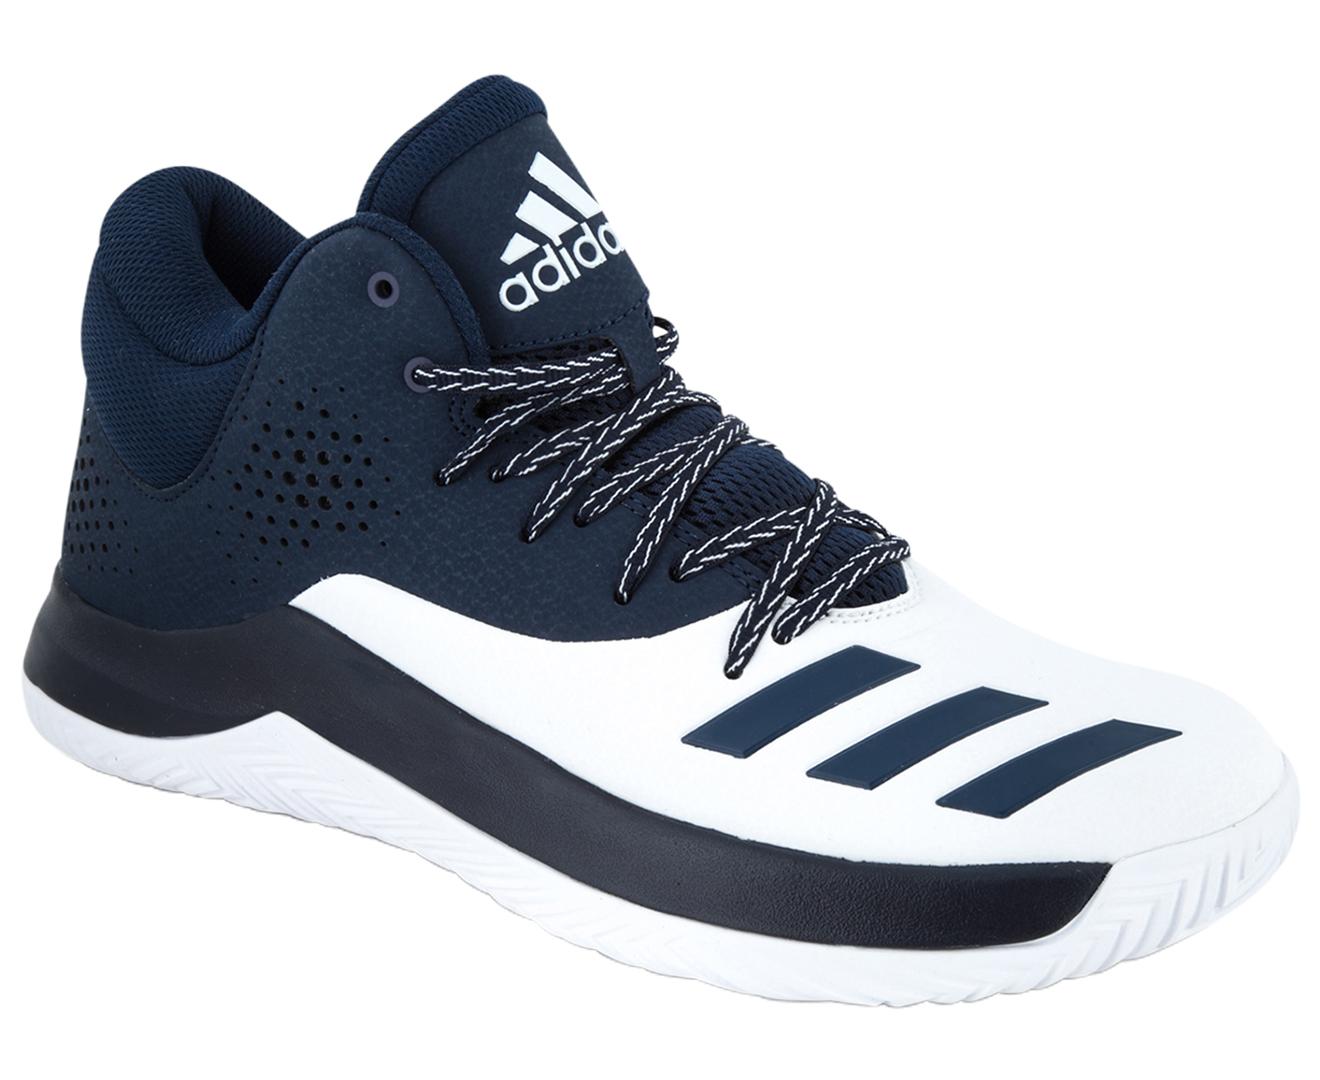 adidas court fury 2017